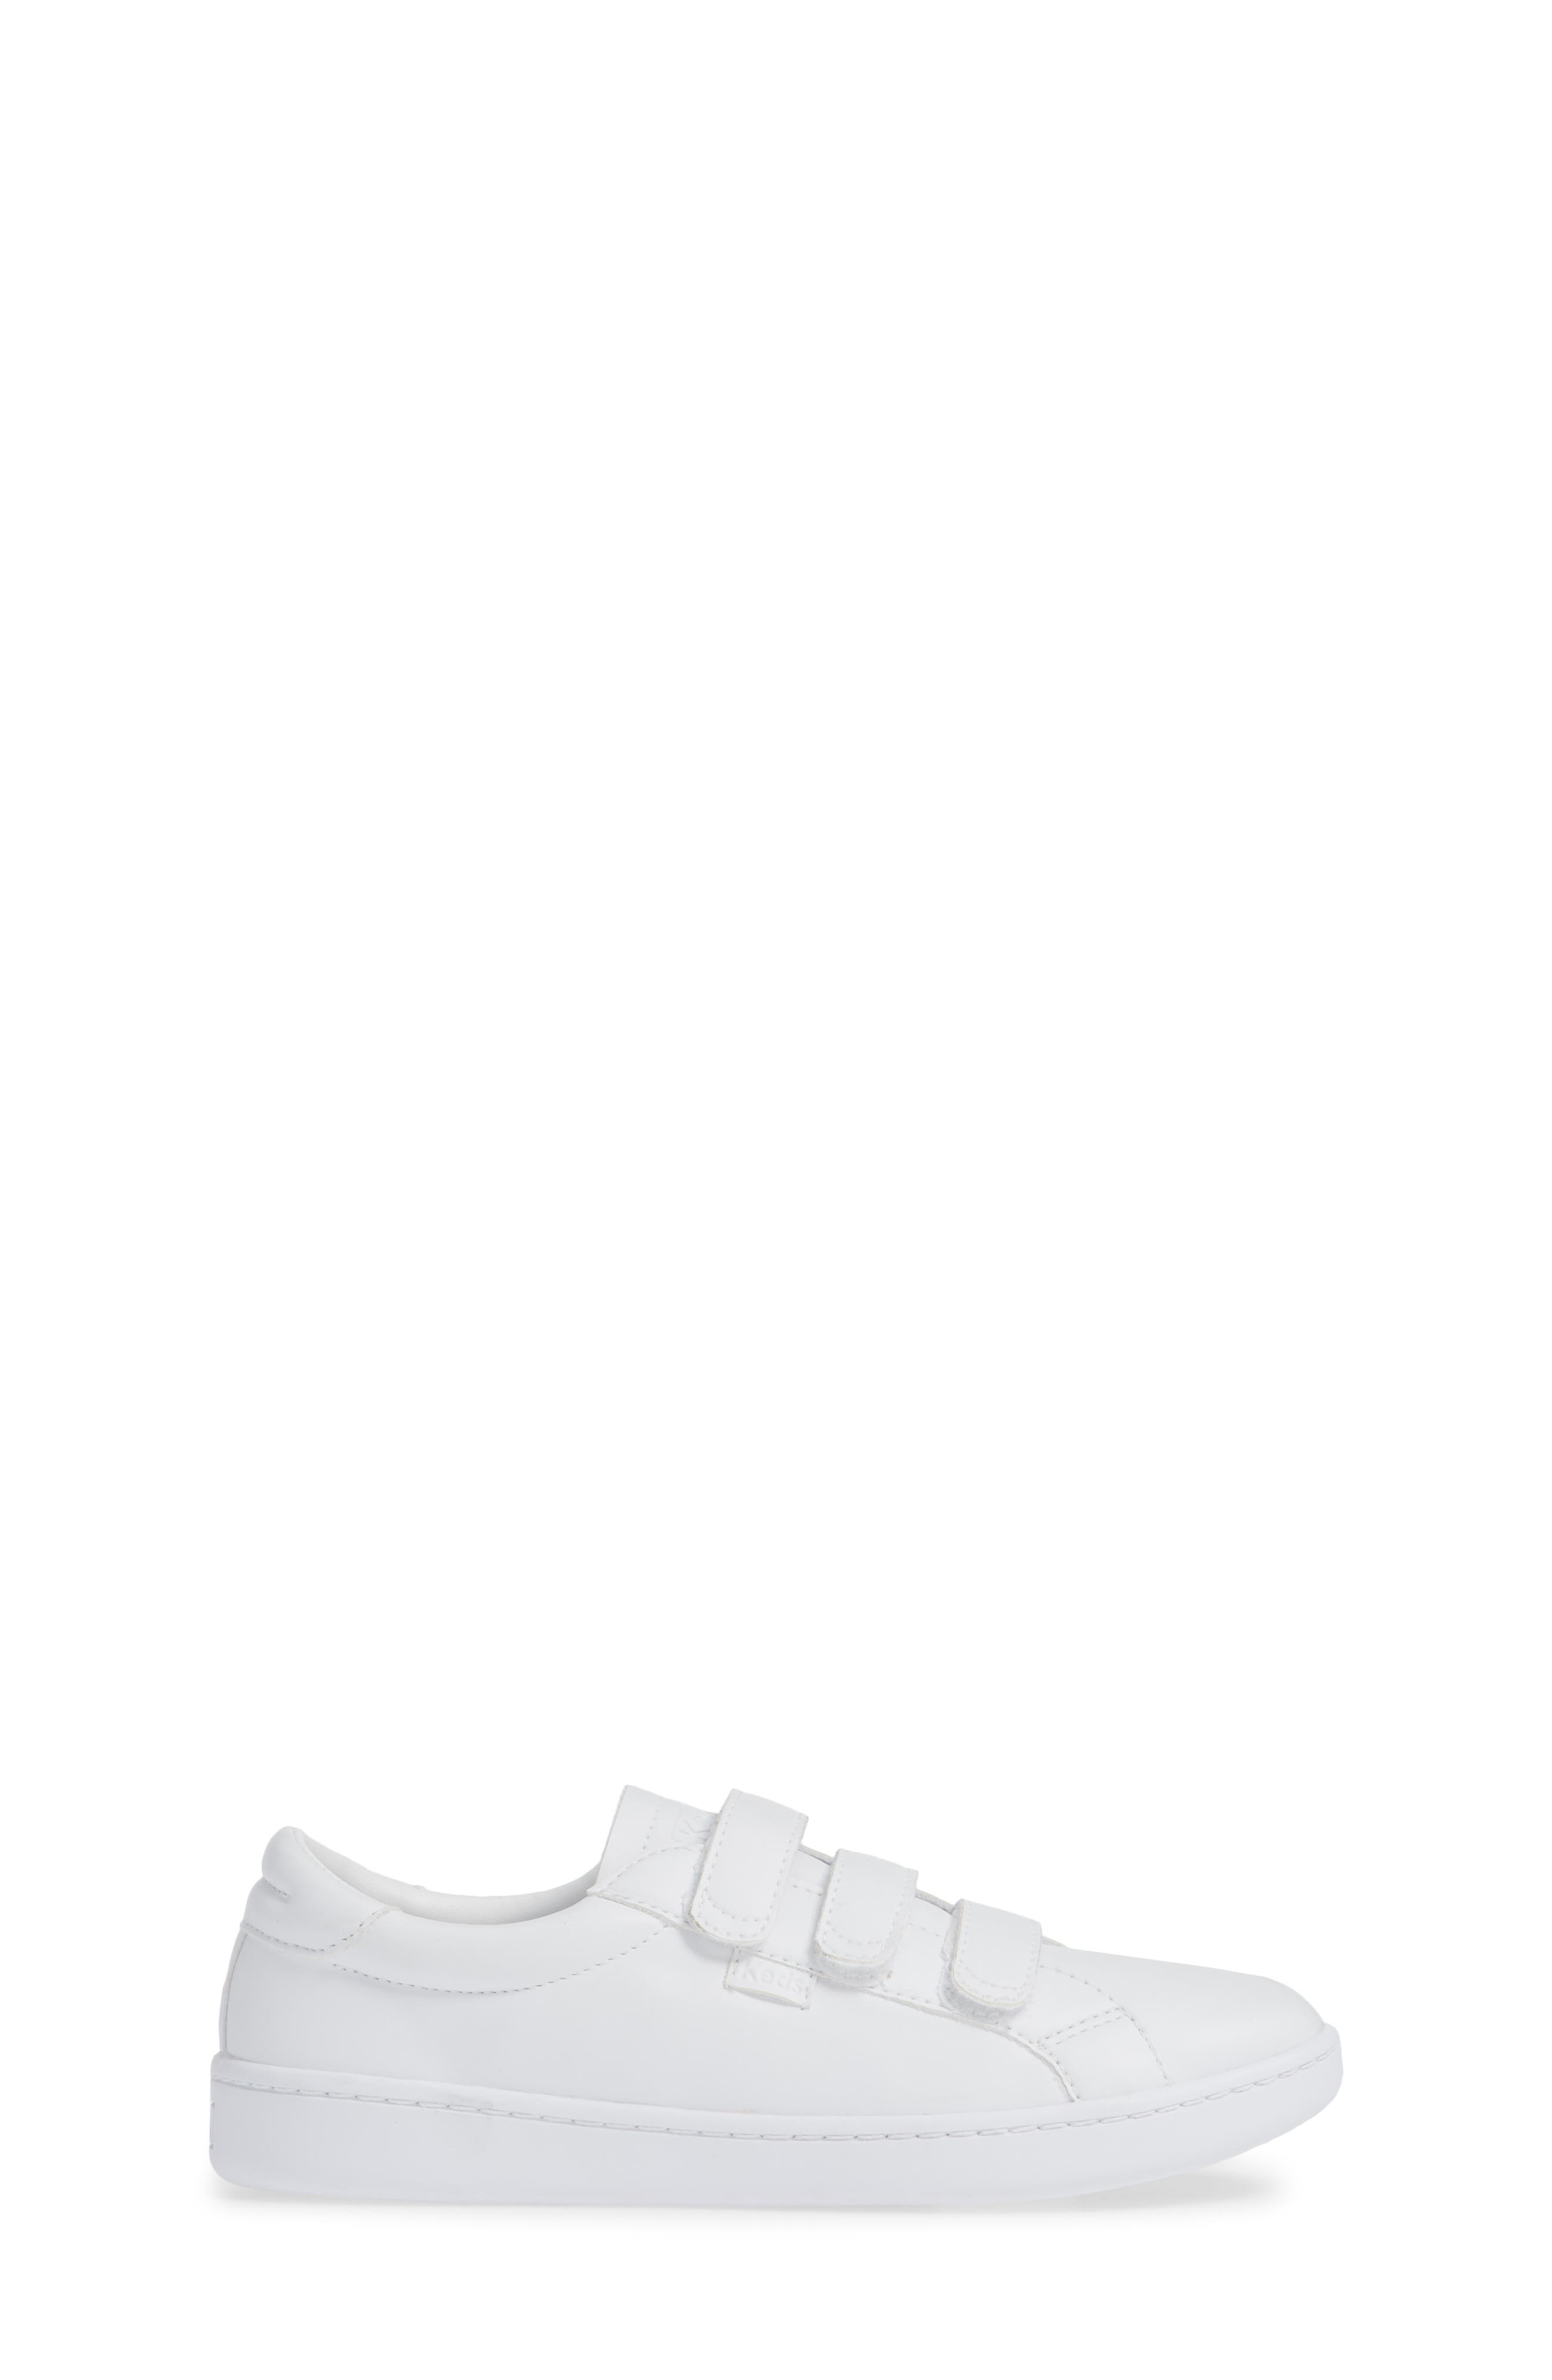 KEDS<SUP>®</SUP>, Ace 3V Sneaker, Alternate thumbnail 3, color, 100